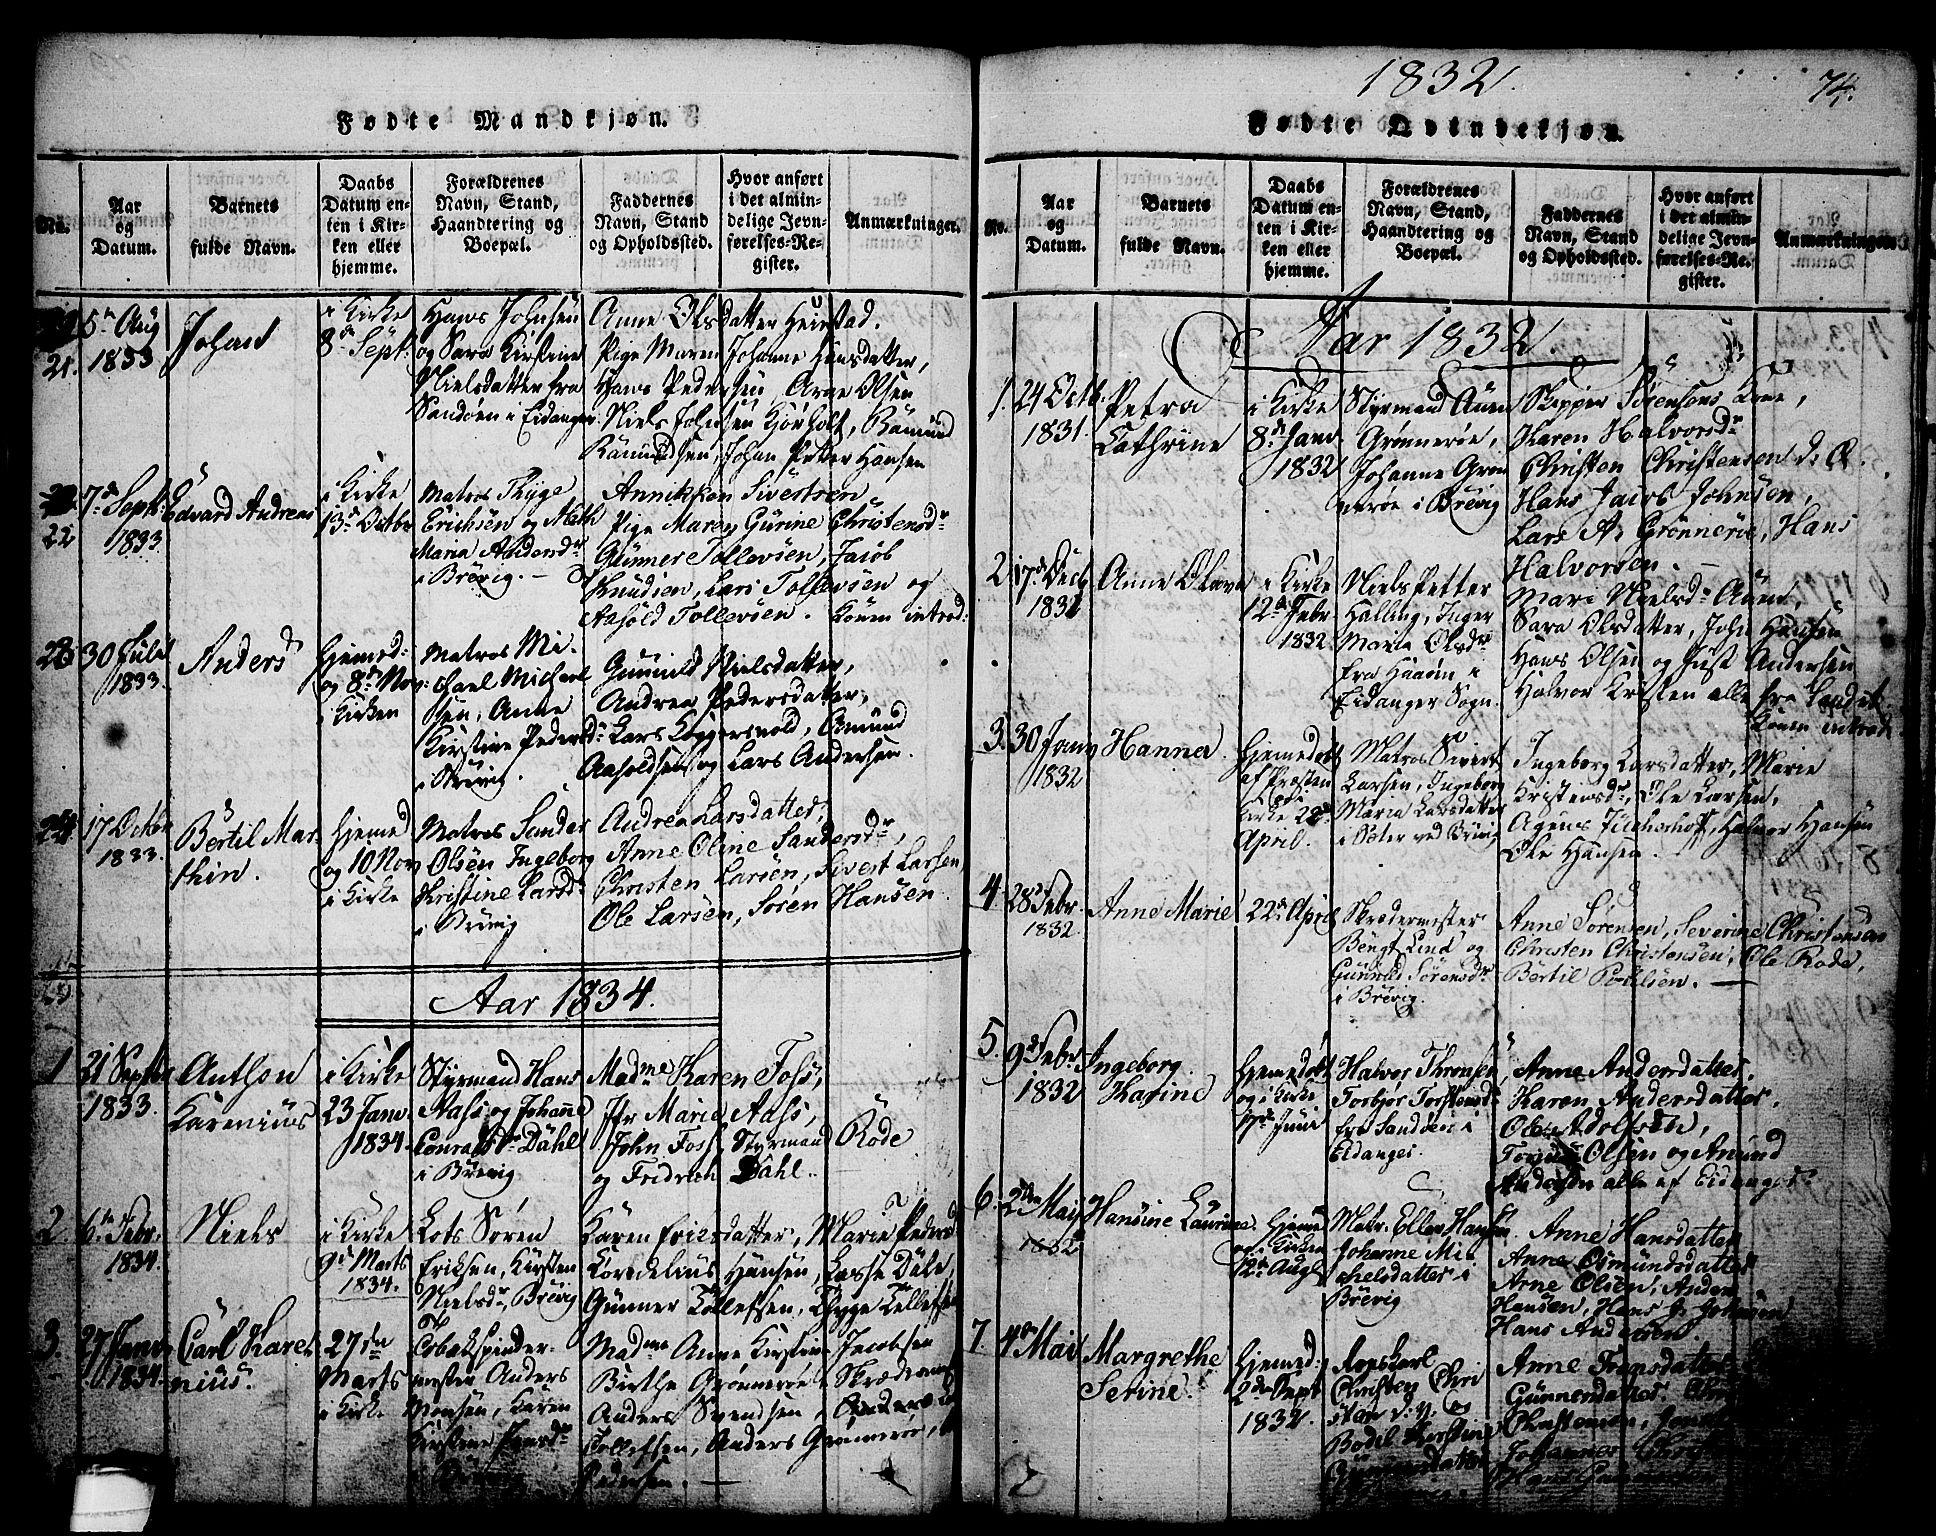 SAKO, Brevik kirkebøker, G/Ga/L0001: Klokkerbok nr. 1, 1814-1845, s. 74